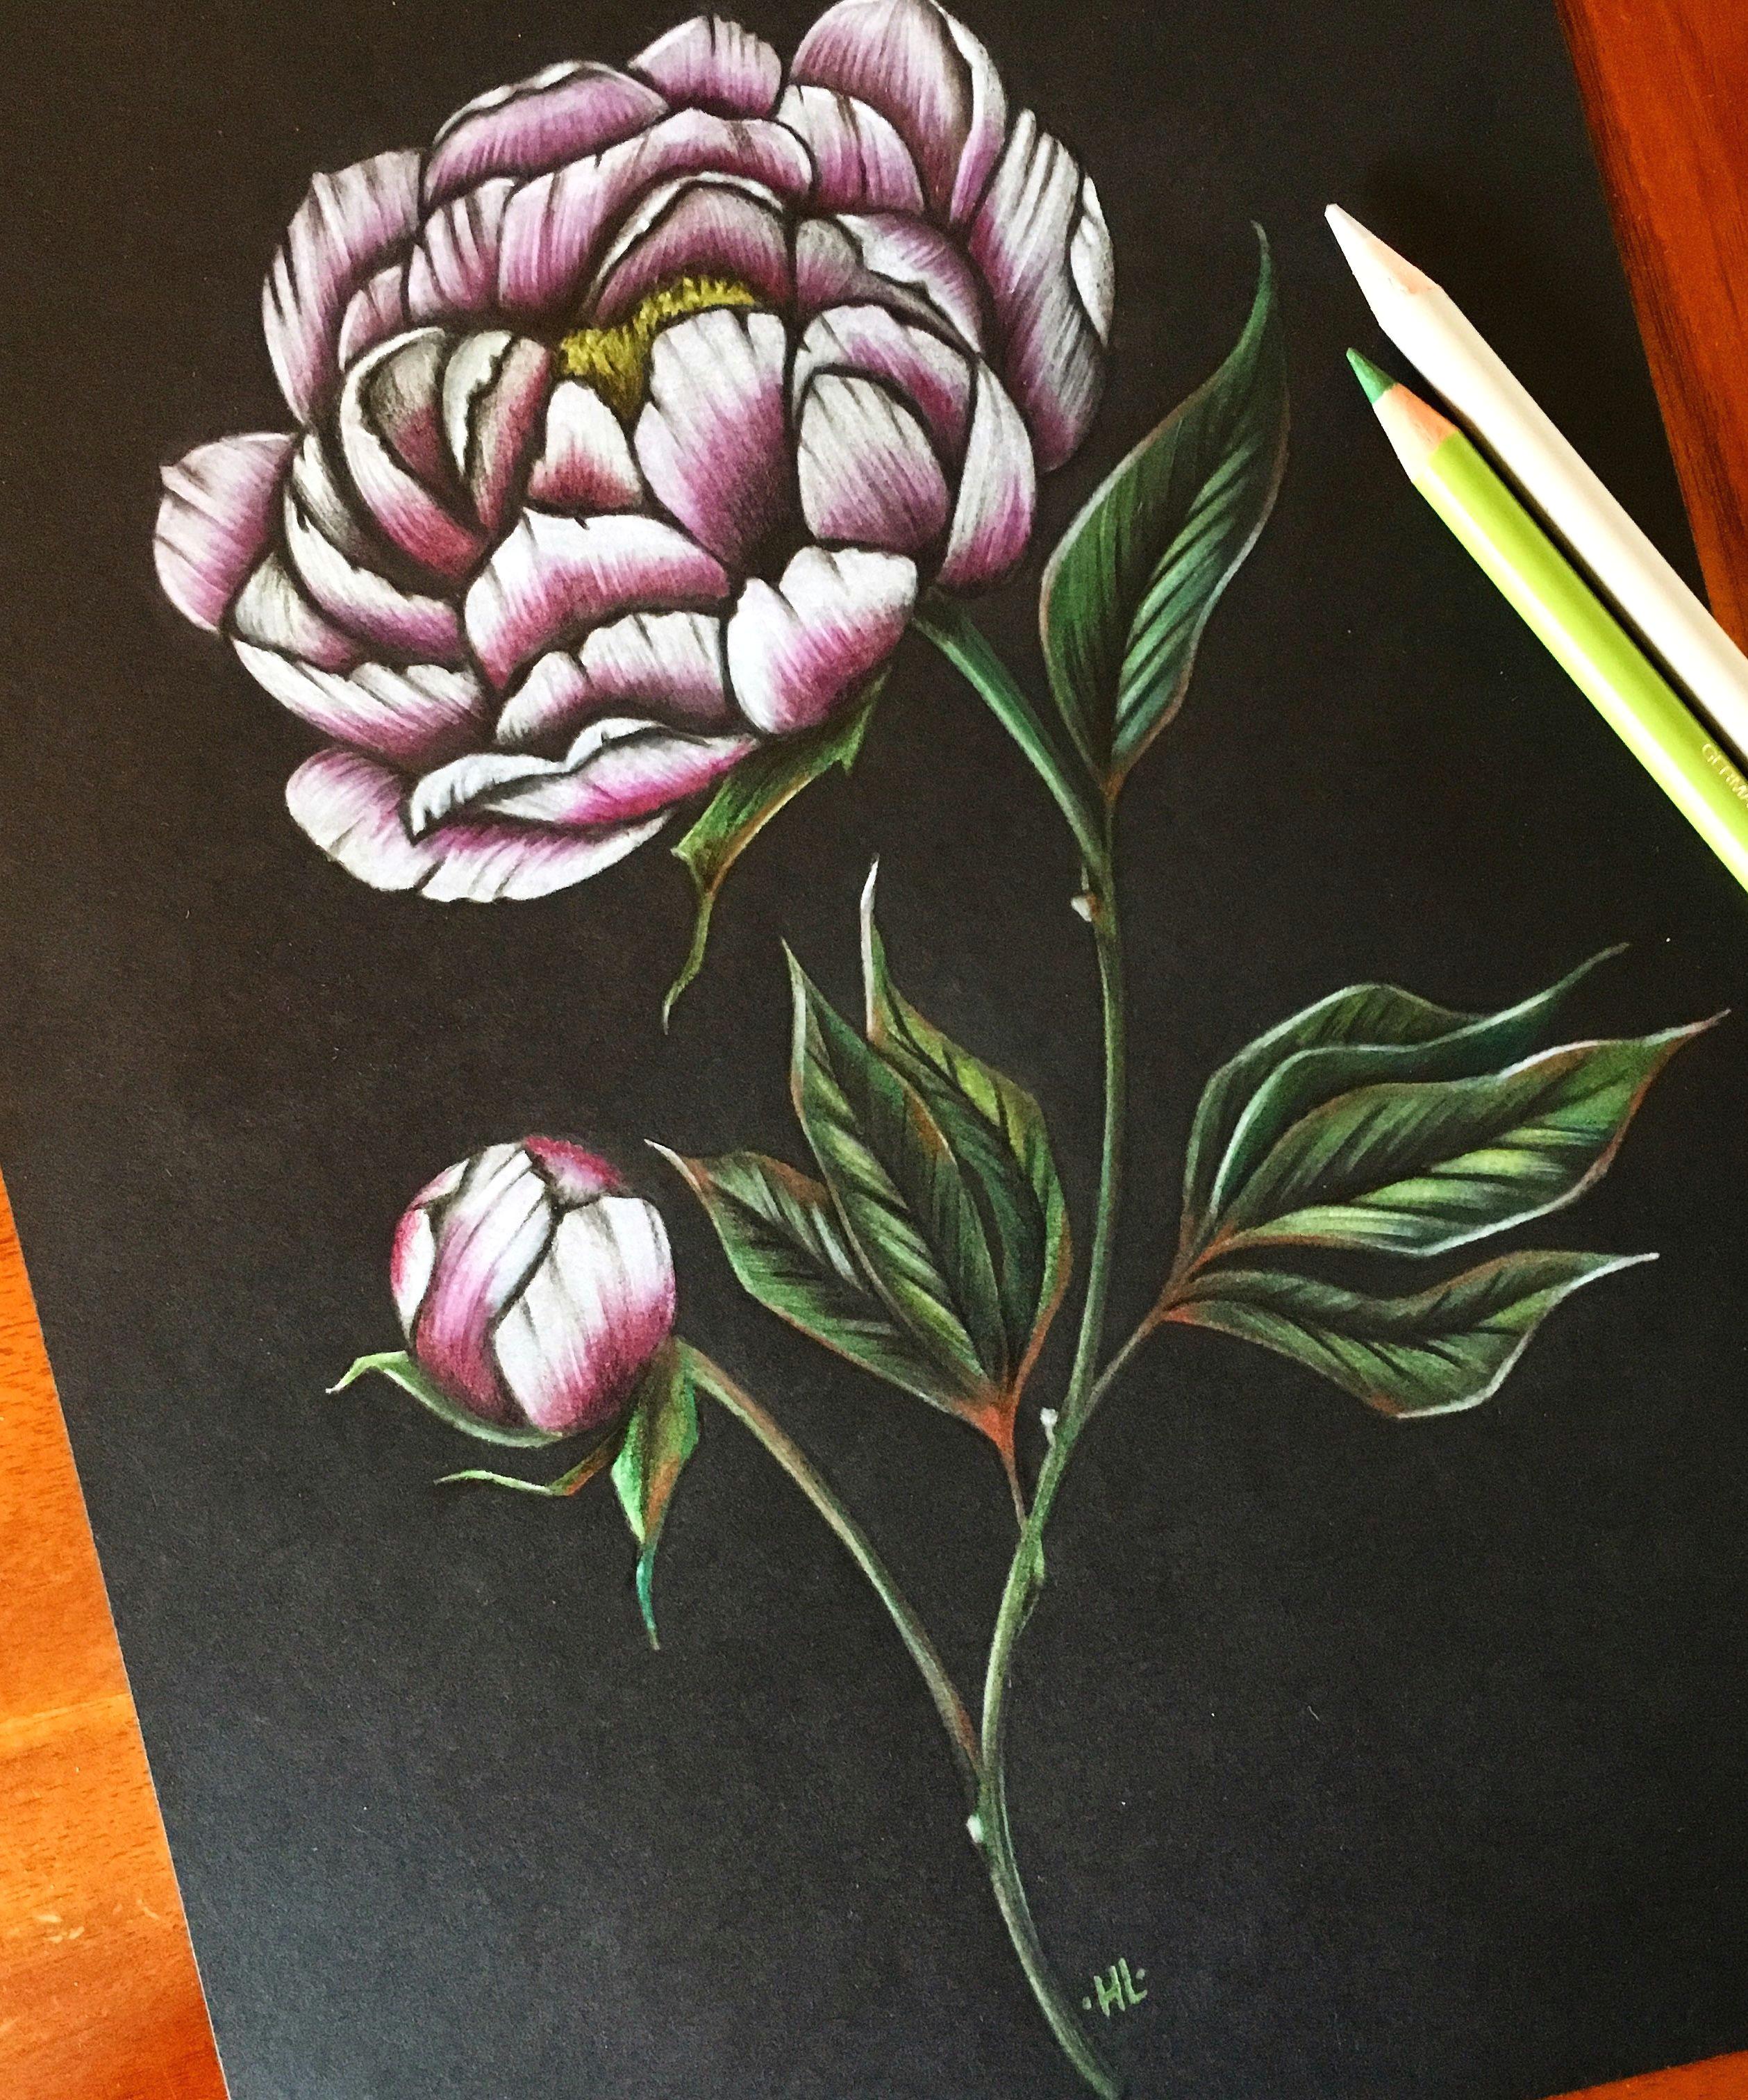 peony art peonies drawing flower pencil art coloured pencil vintage art botanical illustration